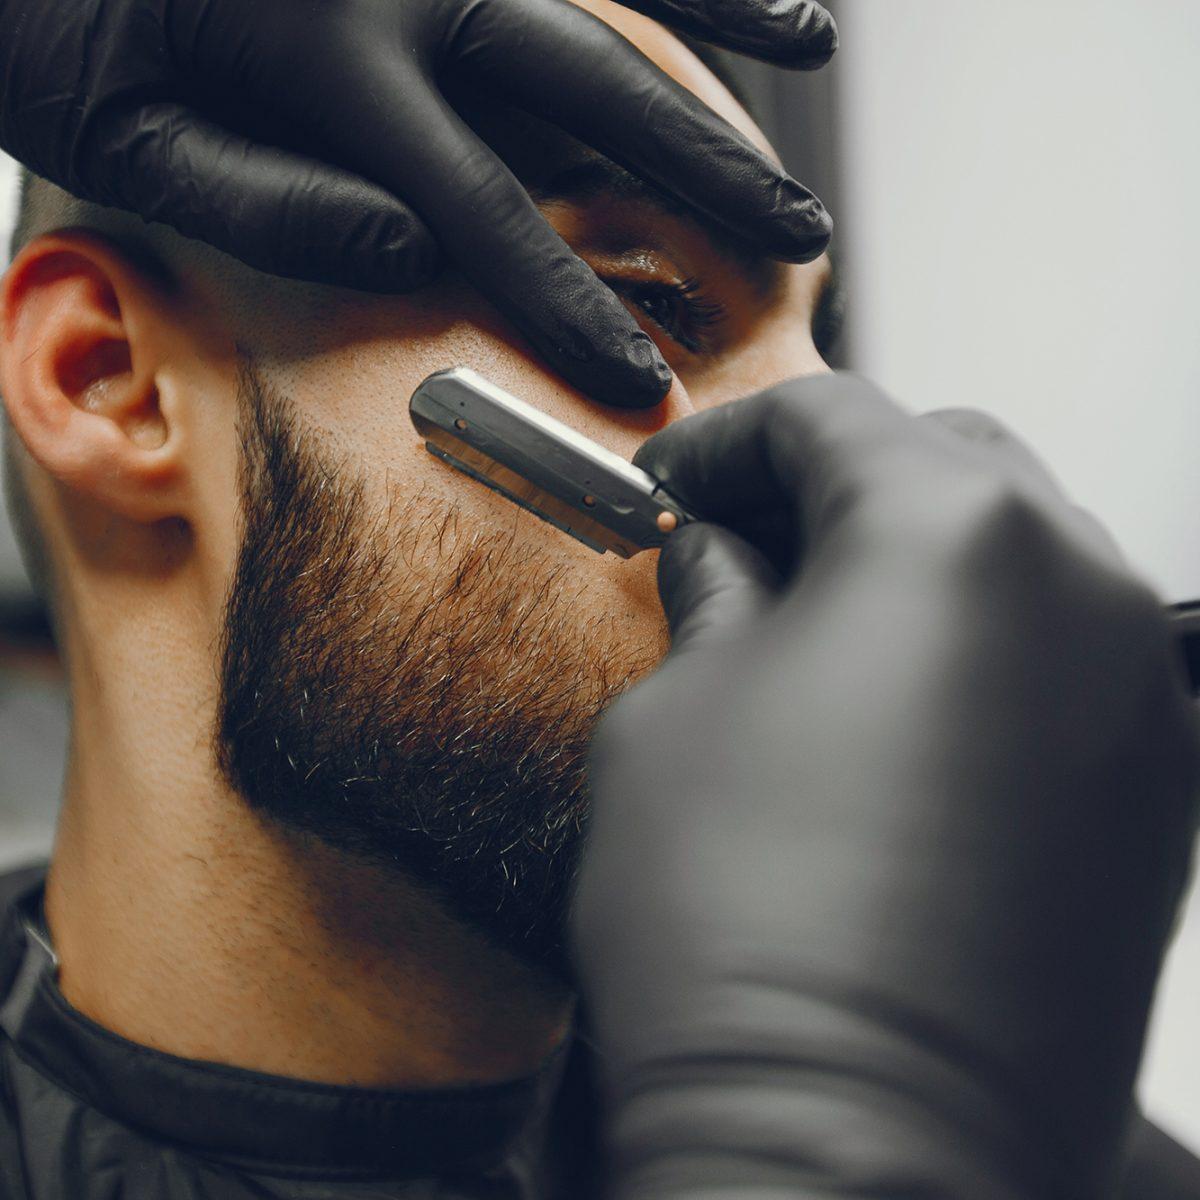 Maxime-homme-page-accueil-barbier-coiffeur--orfevres11